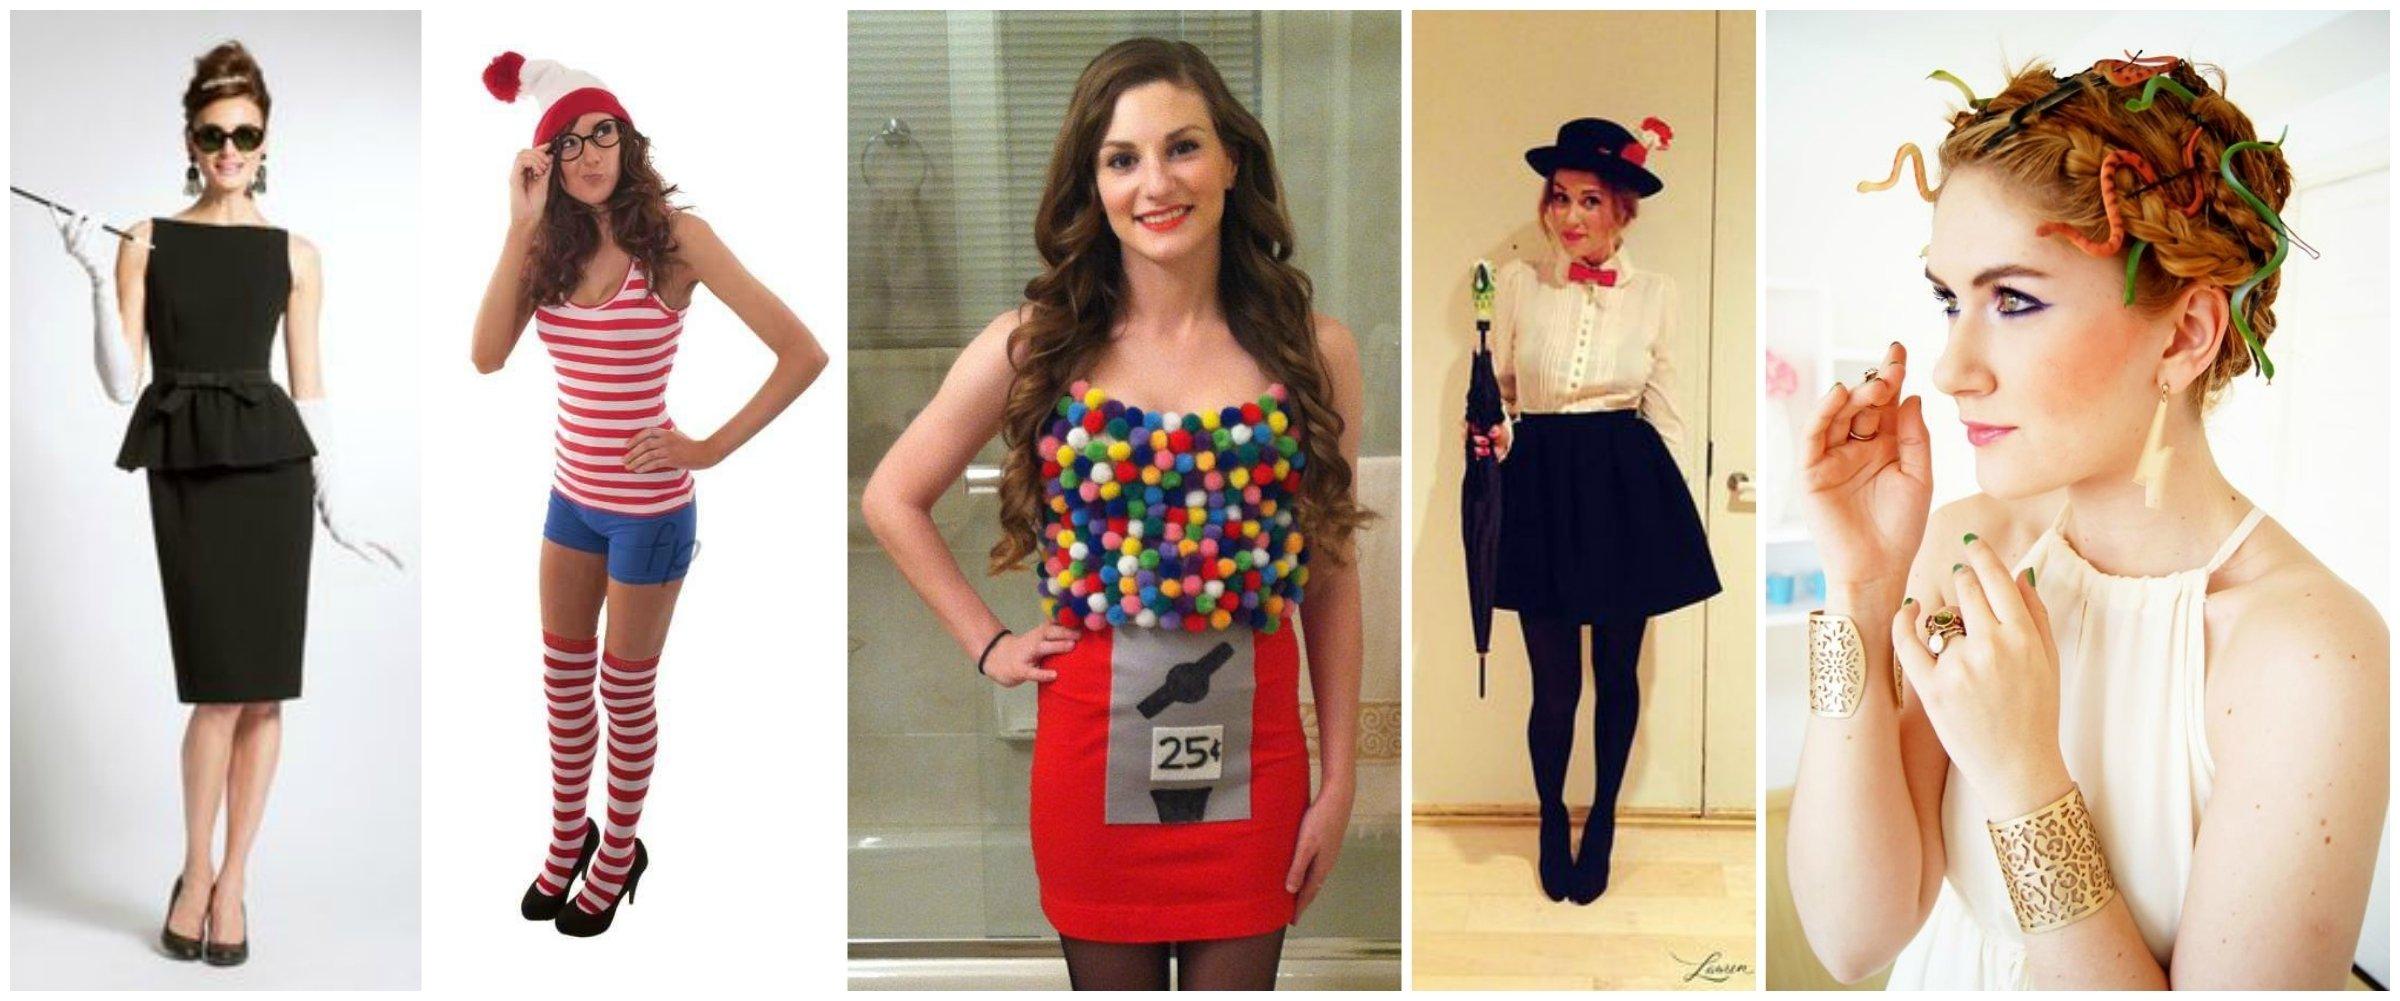 10 Fantastic Simple Costume Ideas For Women 61 costume ideas for best 10 group costumes ideas on pinterest work 3 2020